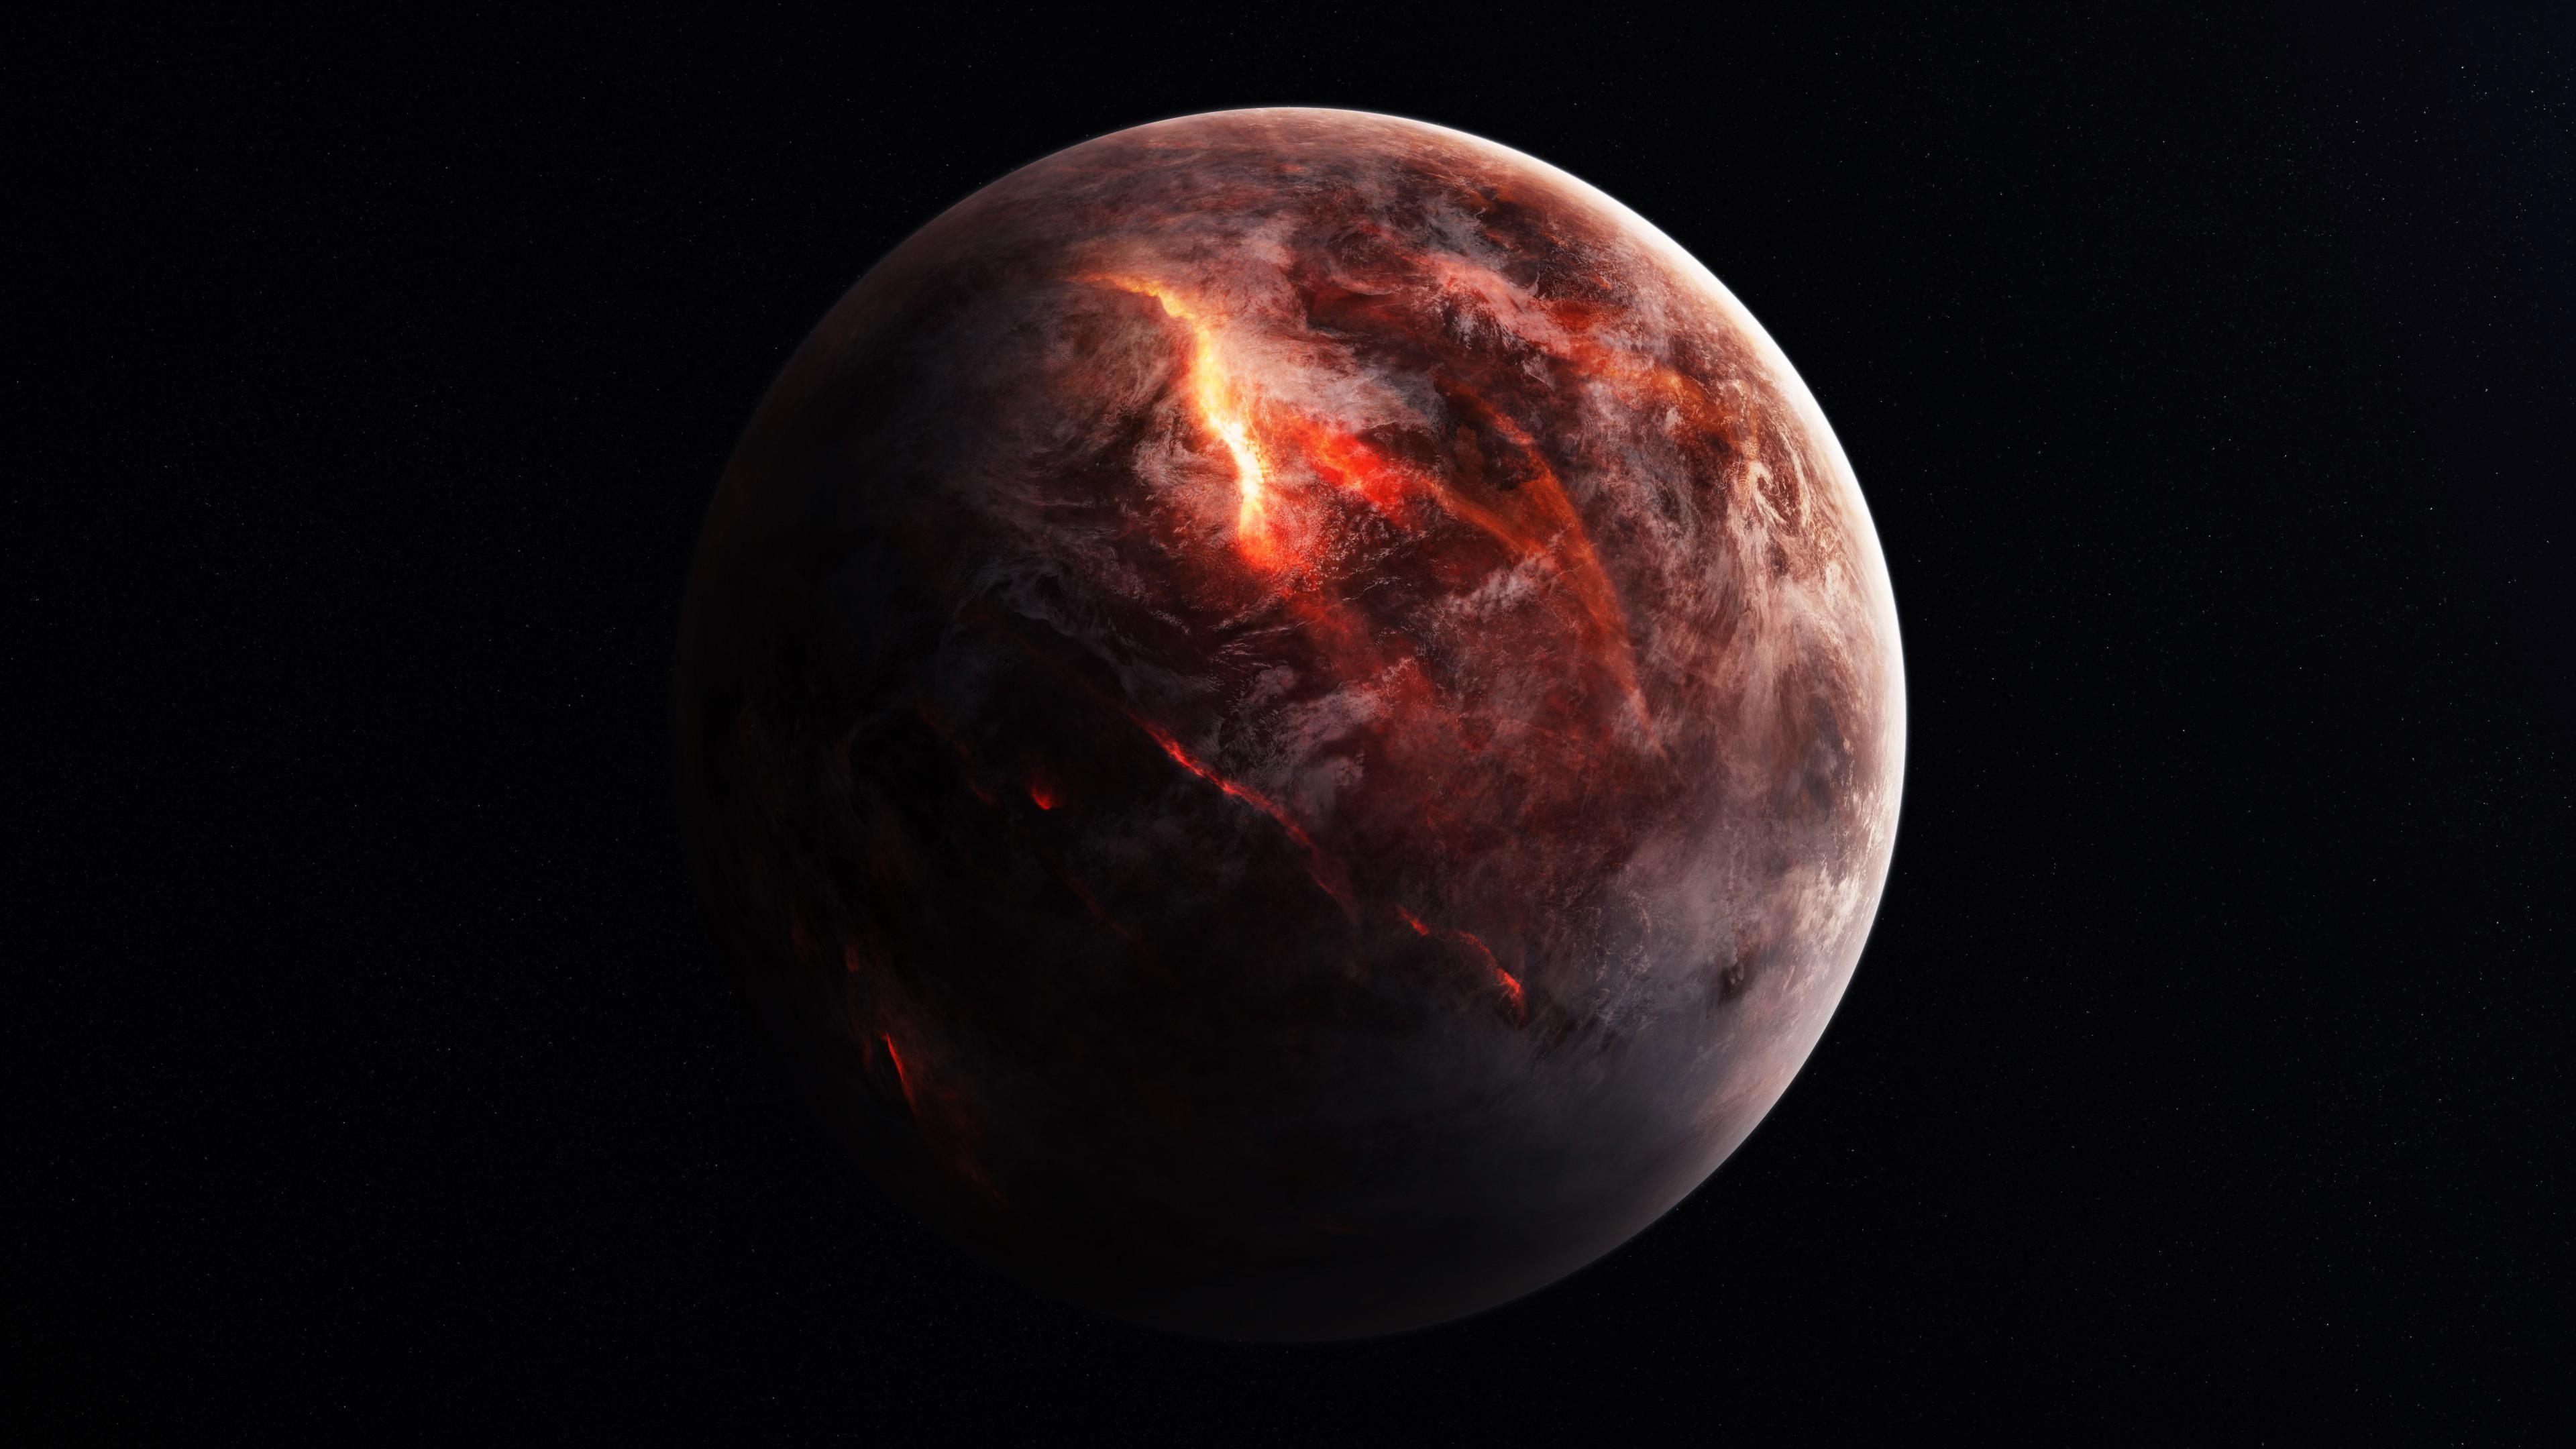 4k Fire Planet 3840x2160 Wallpaper Space Desktop Wallpaper Hd Wallpaper